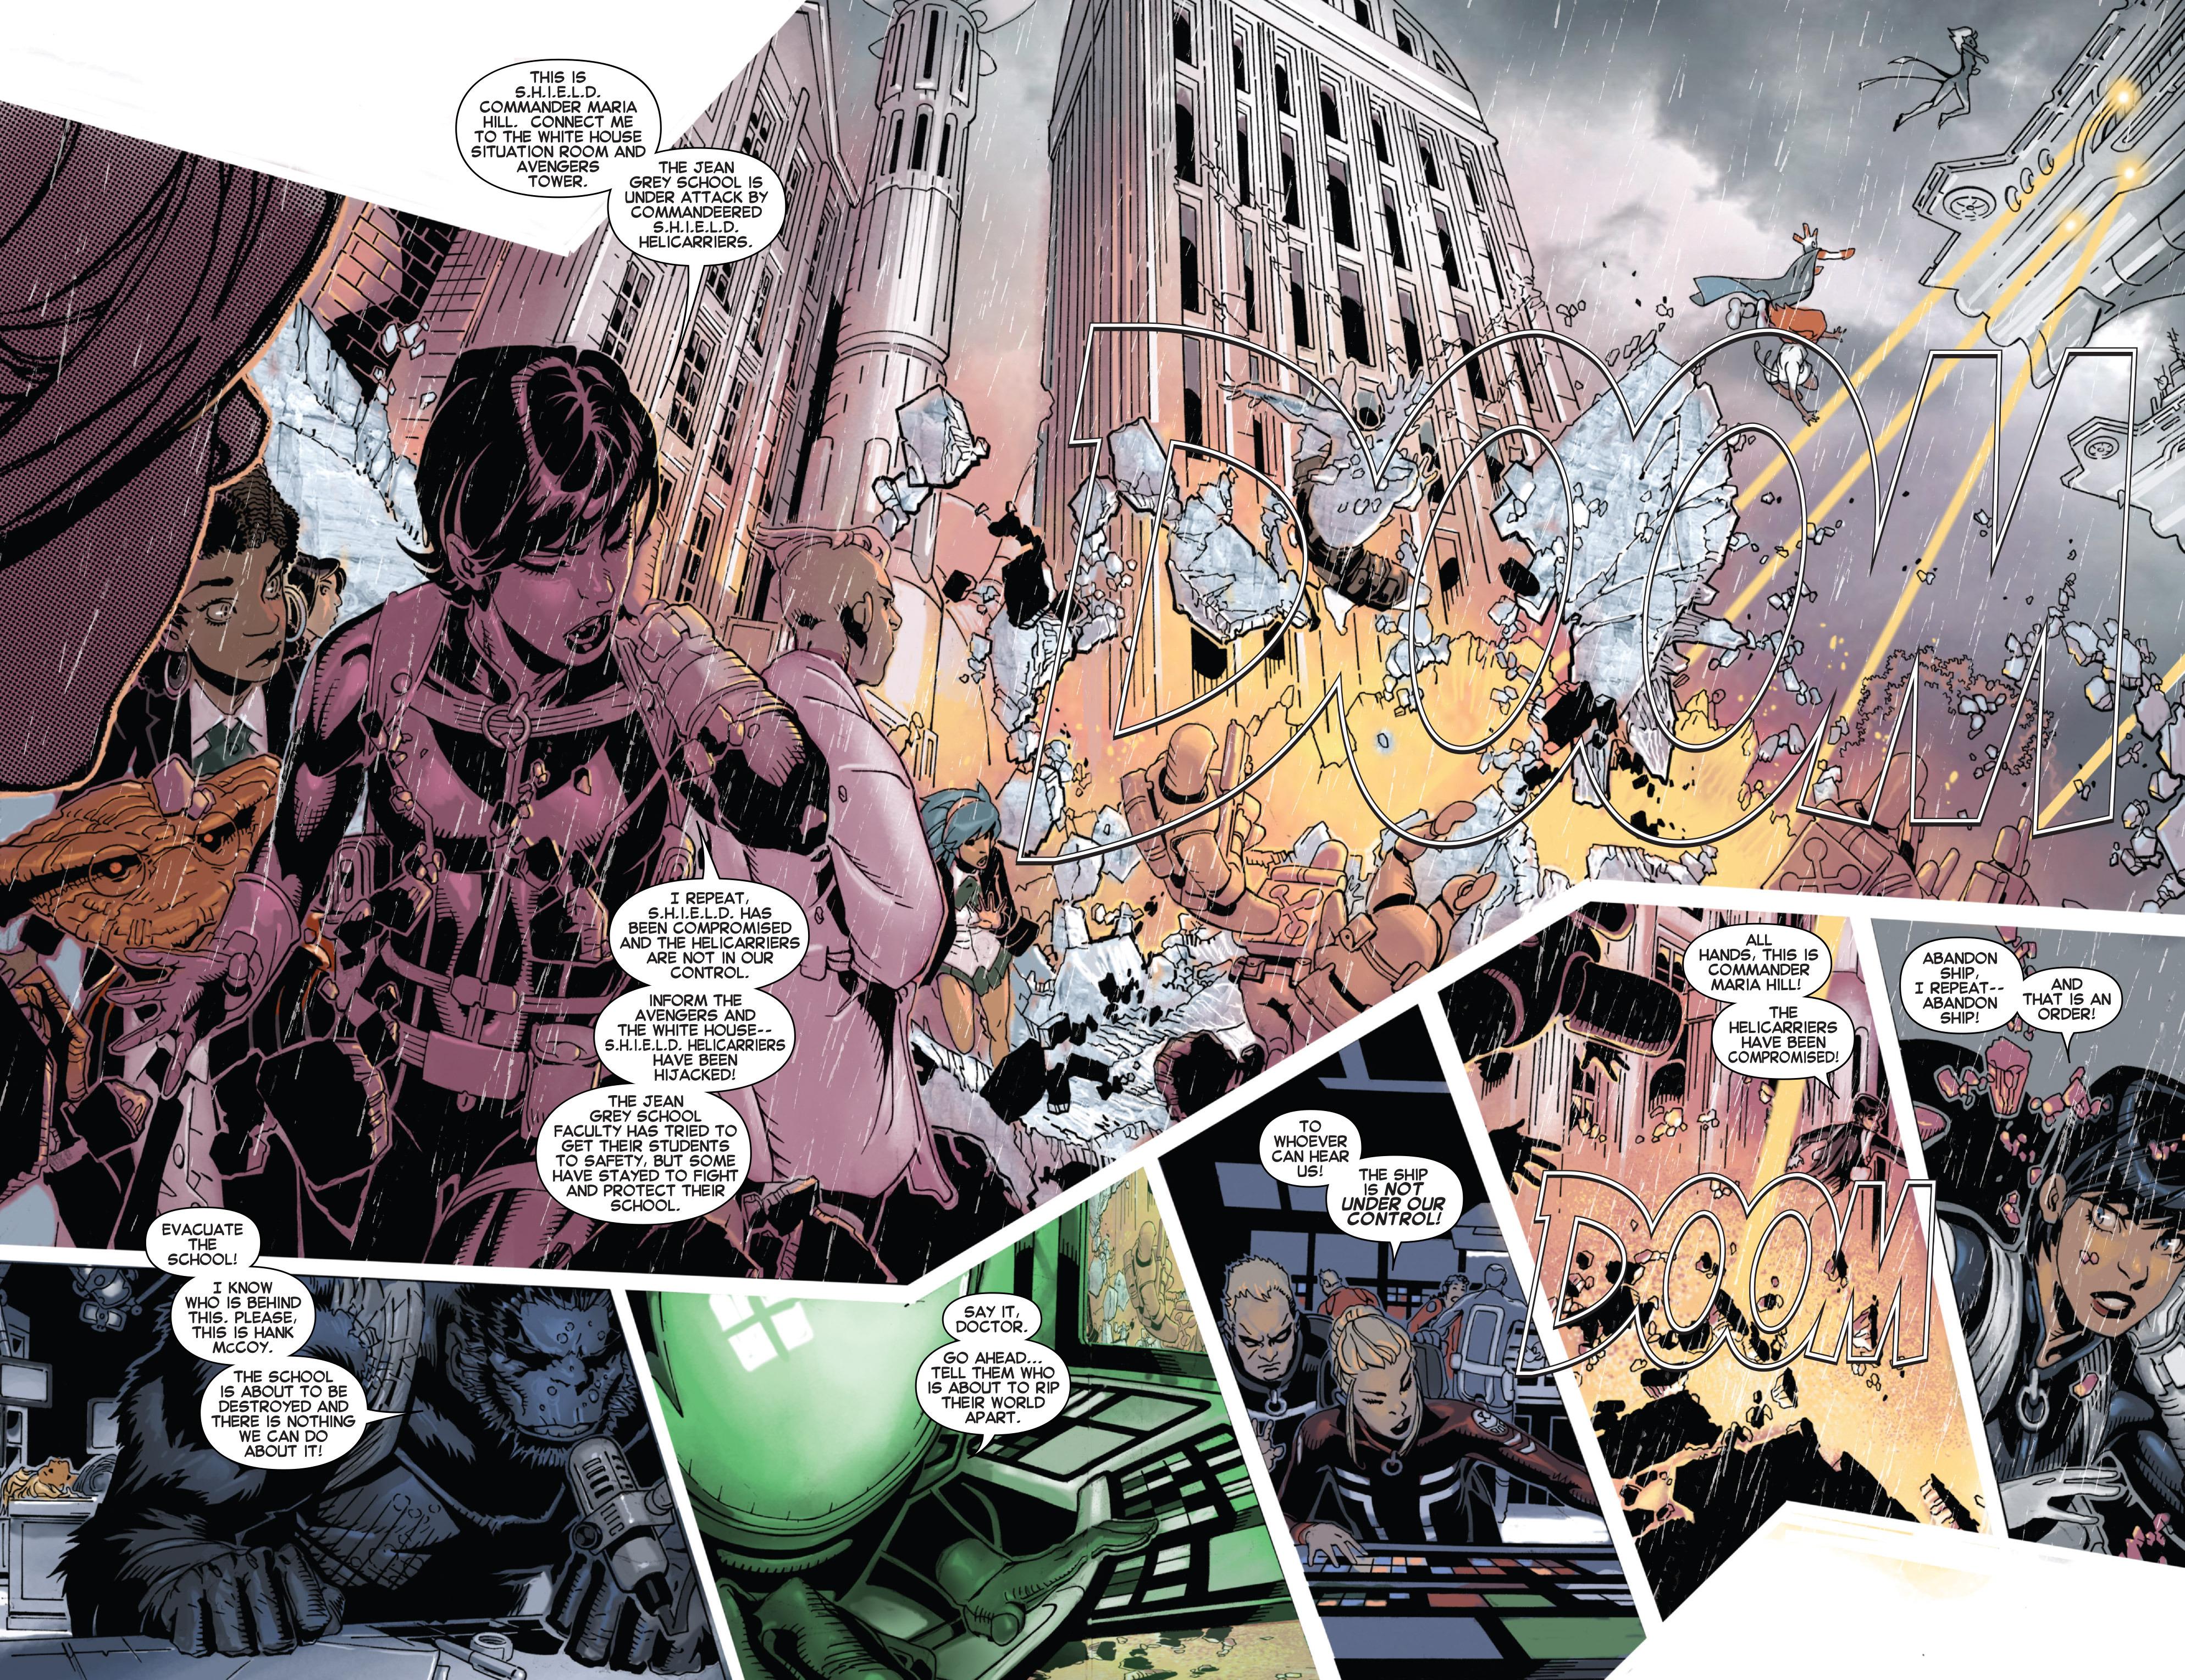 Read online Uncanny X-Men (2013) comic -  Issue # _TPB 4 - vs. S.H.I.E.L.D - 66